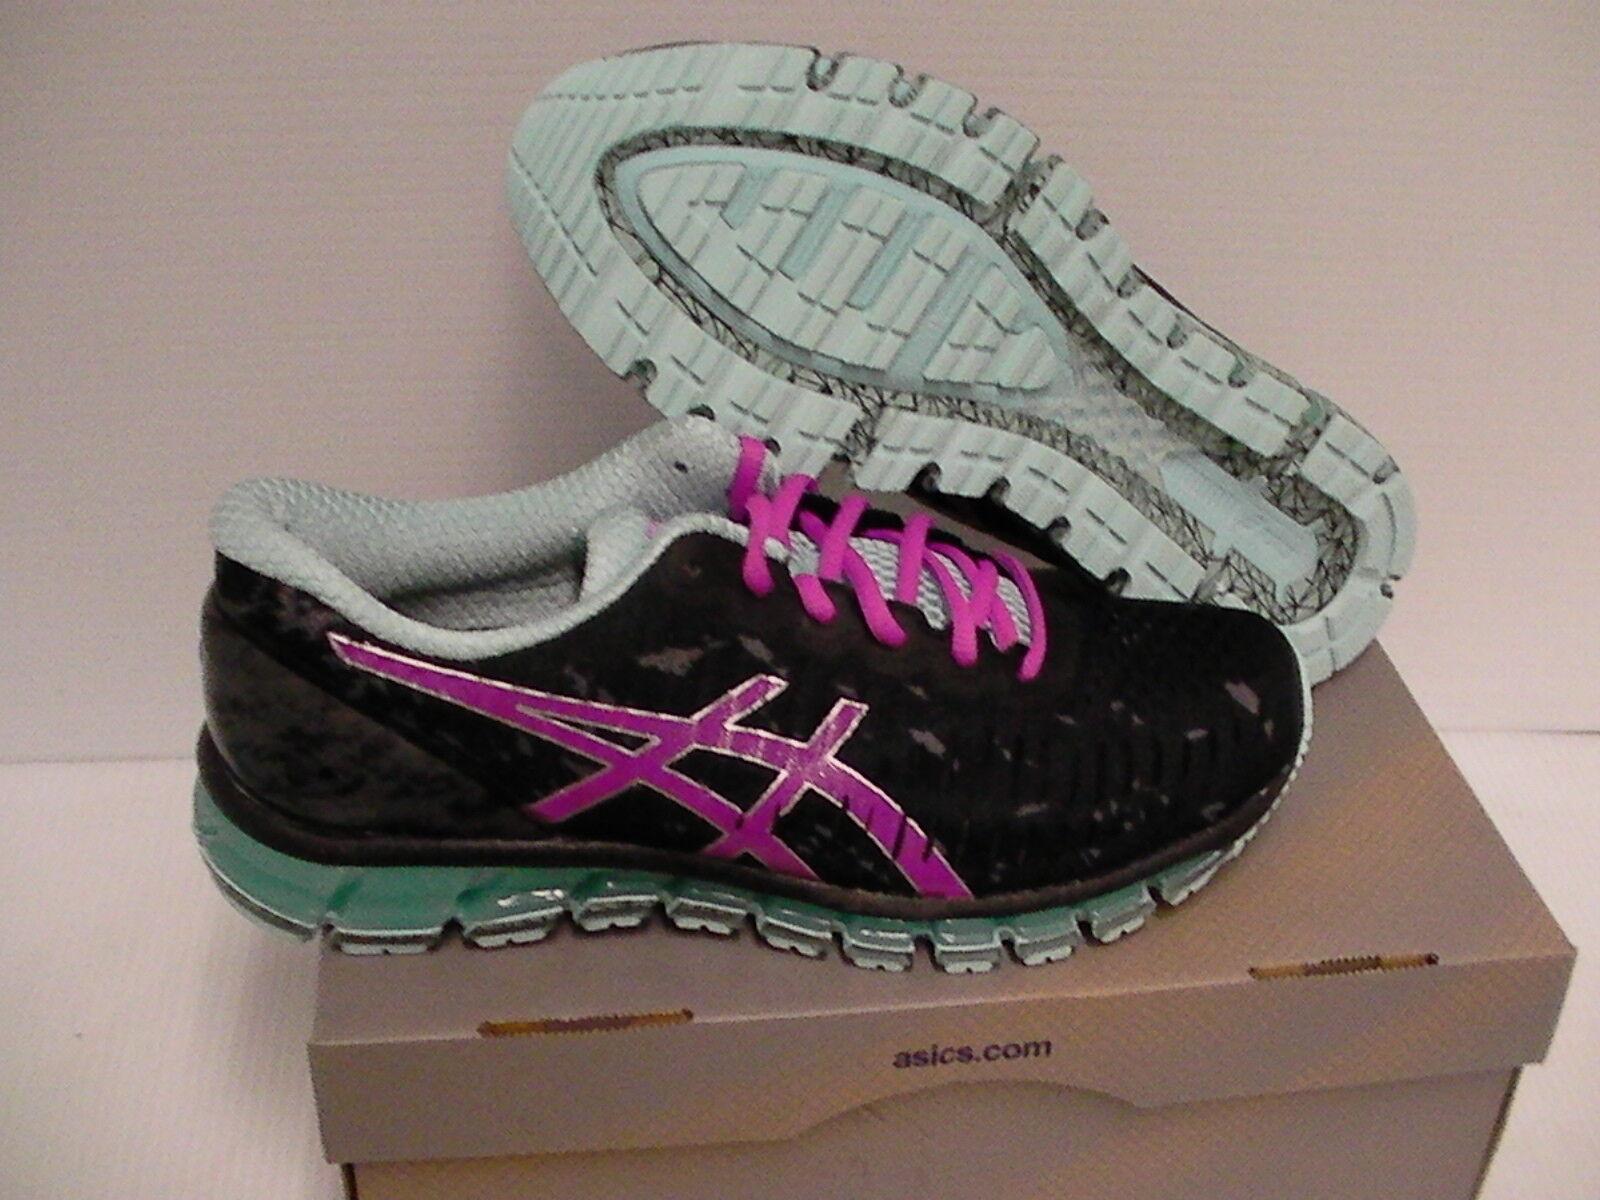 Women's Asics running shoes gel quantum 360 black pink glow size 10 us new